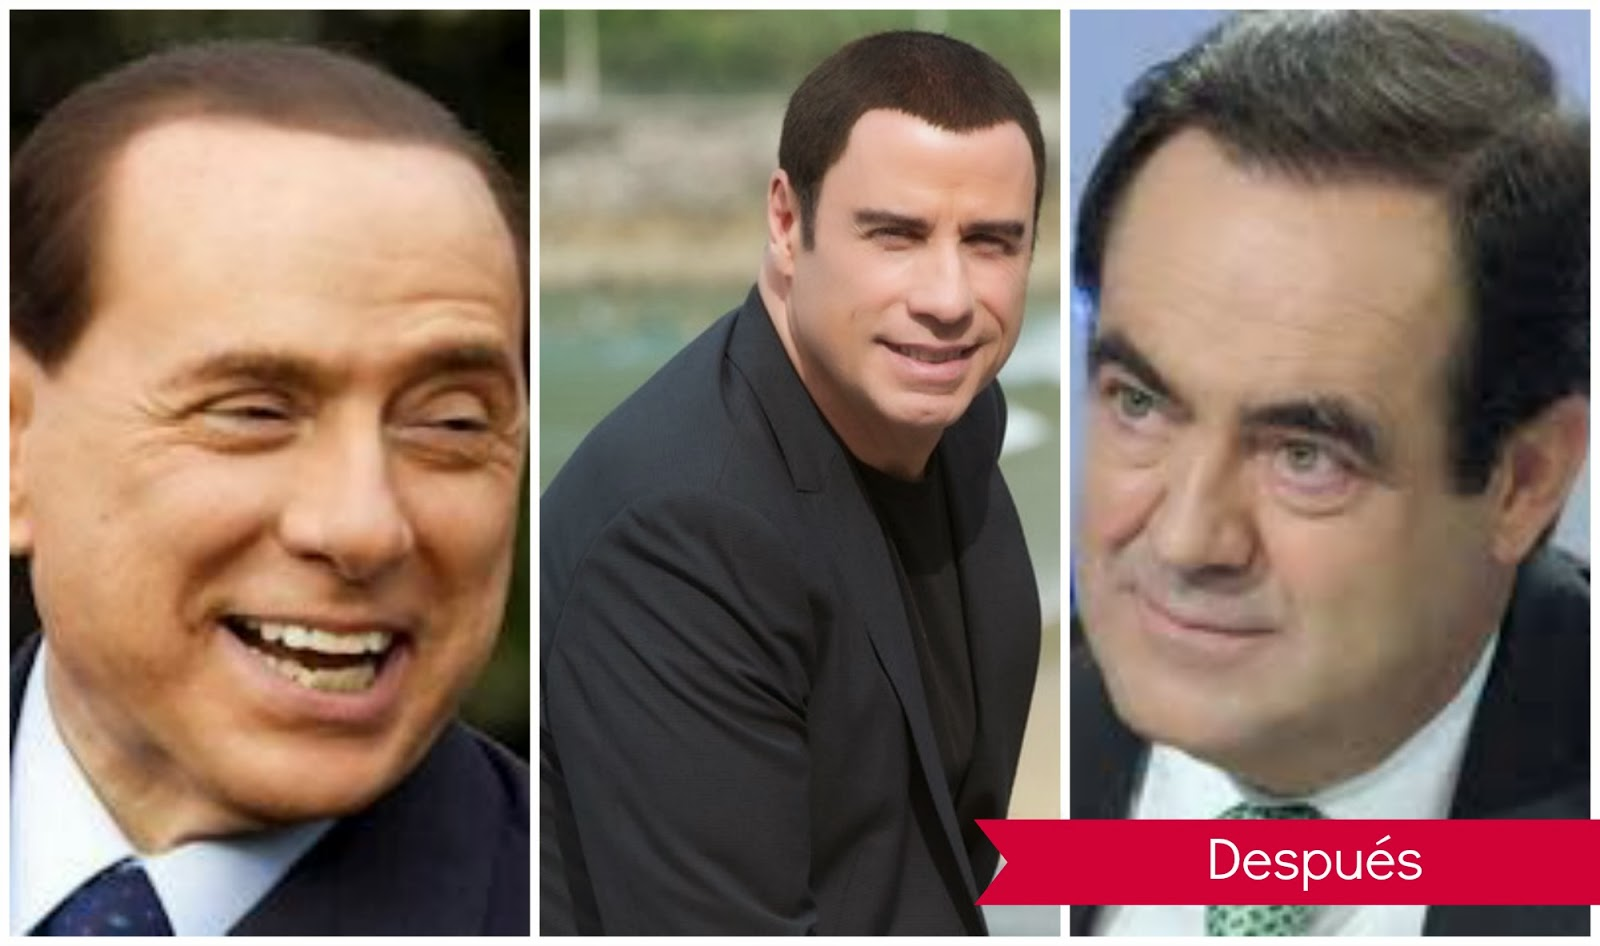 implantes y trasplantes capilares: Silvio Berlusconi, John Travolta, José Bono